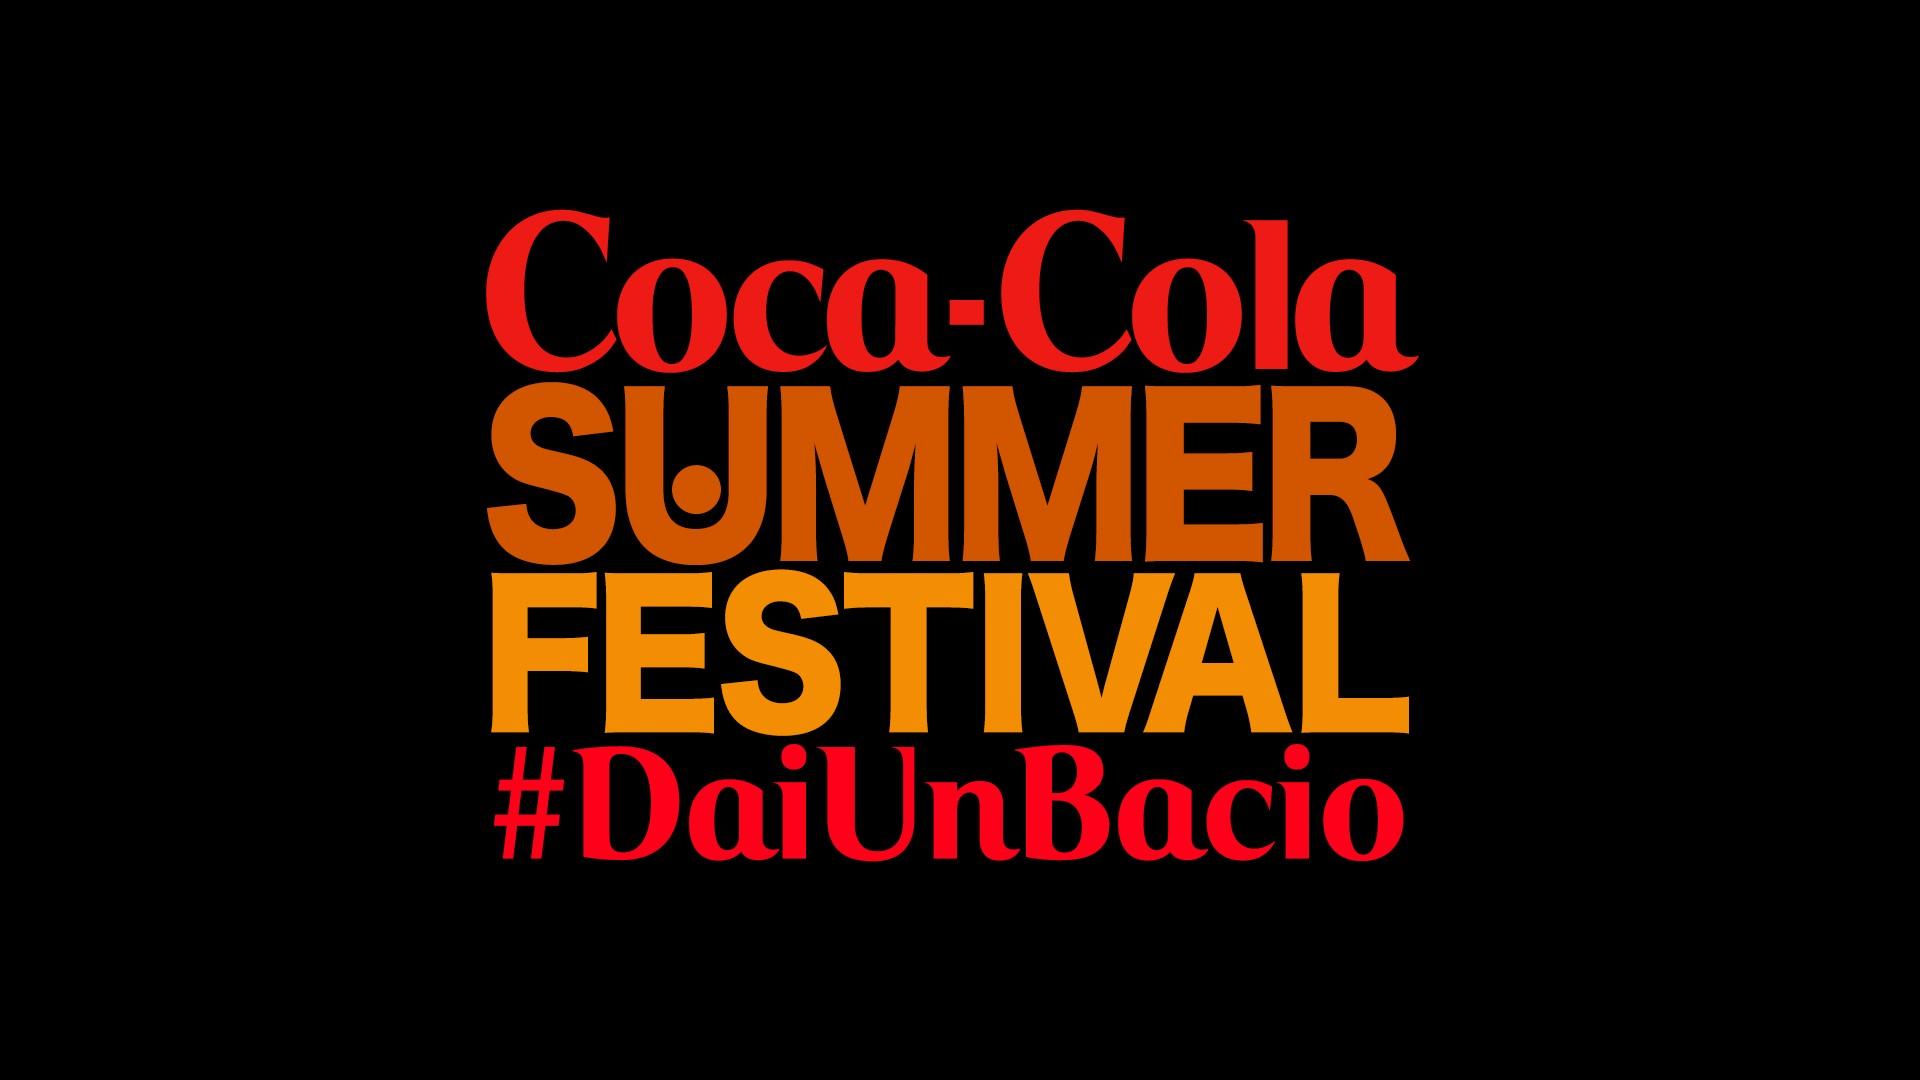 Coca-Cola Summer Festival 2015(1)